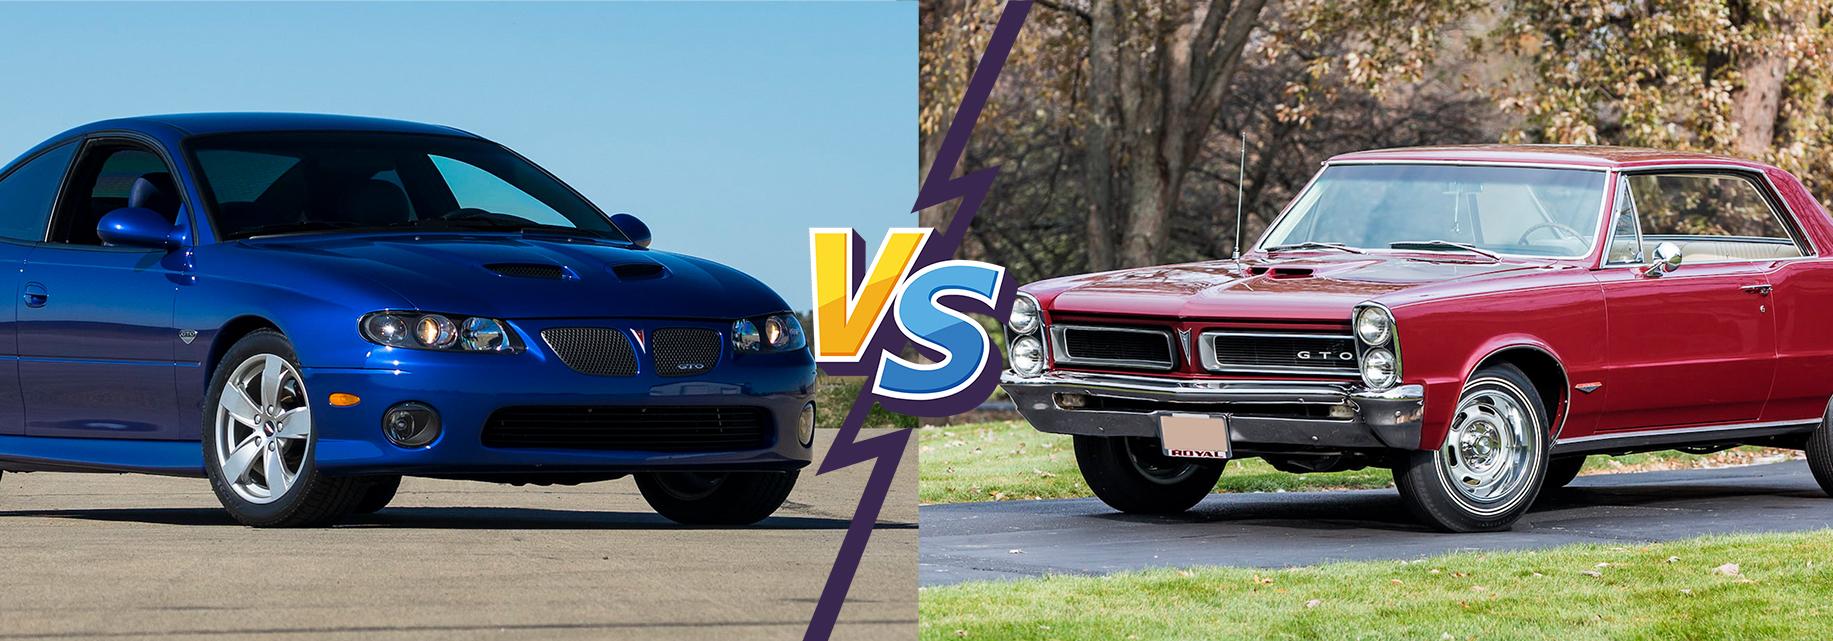 Preach your Pontiac: Classic GTO or modern GTO? thumbnail